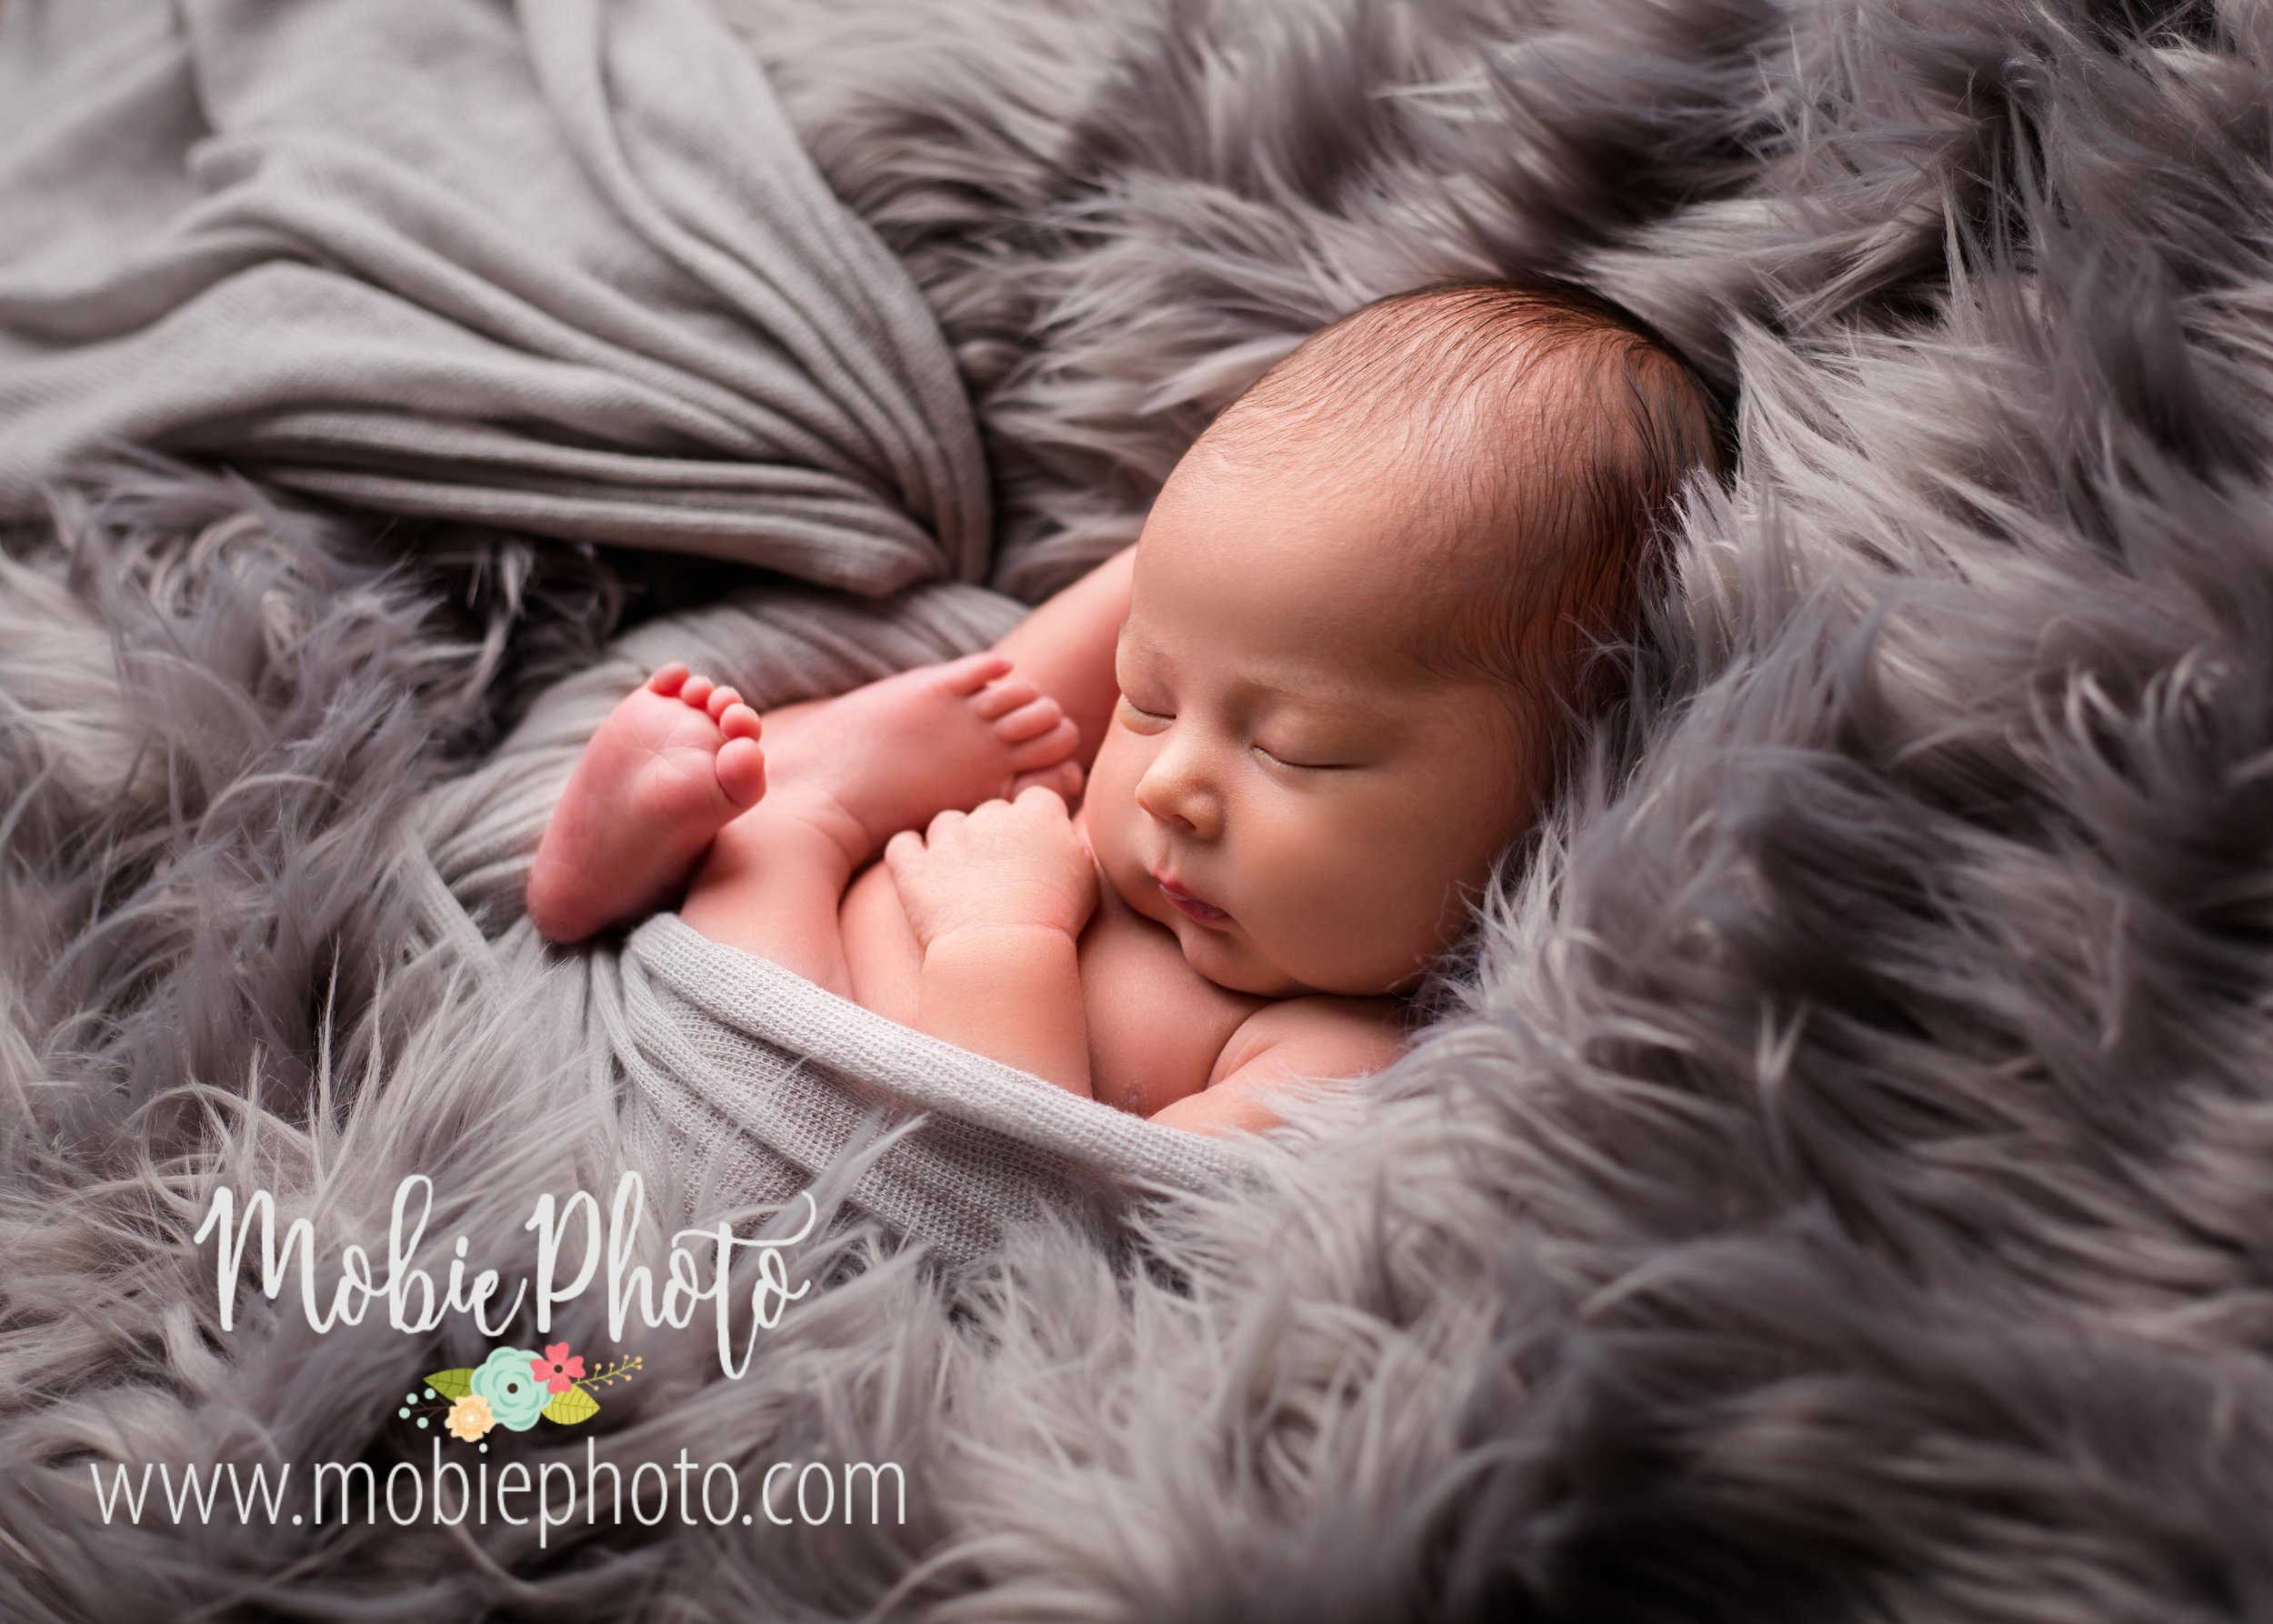 Lehi, Utah Newborn Photographer - Baby Boy Newborn Session with Neutral Colors